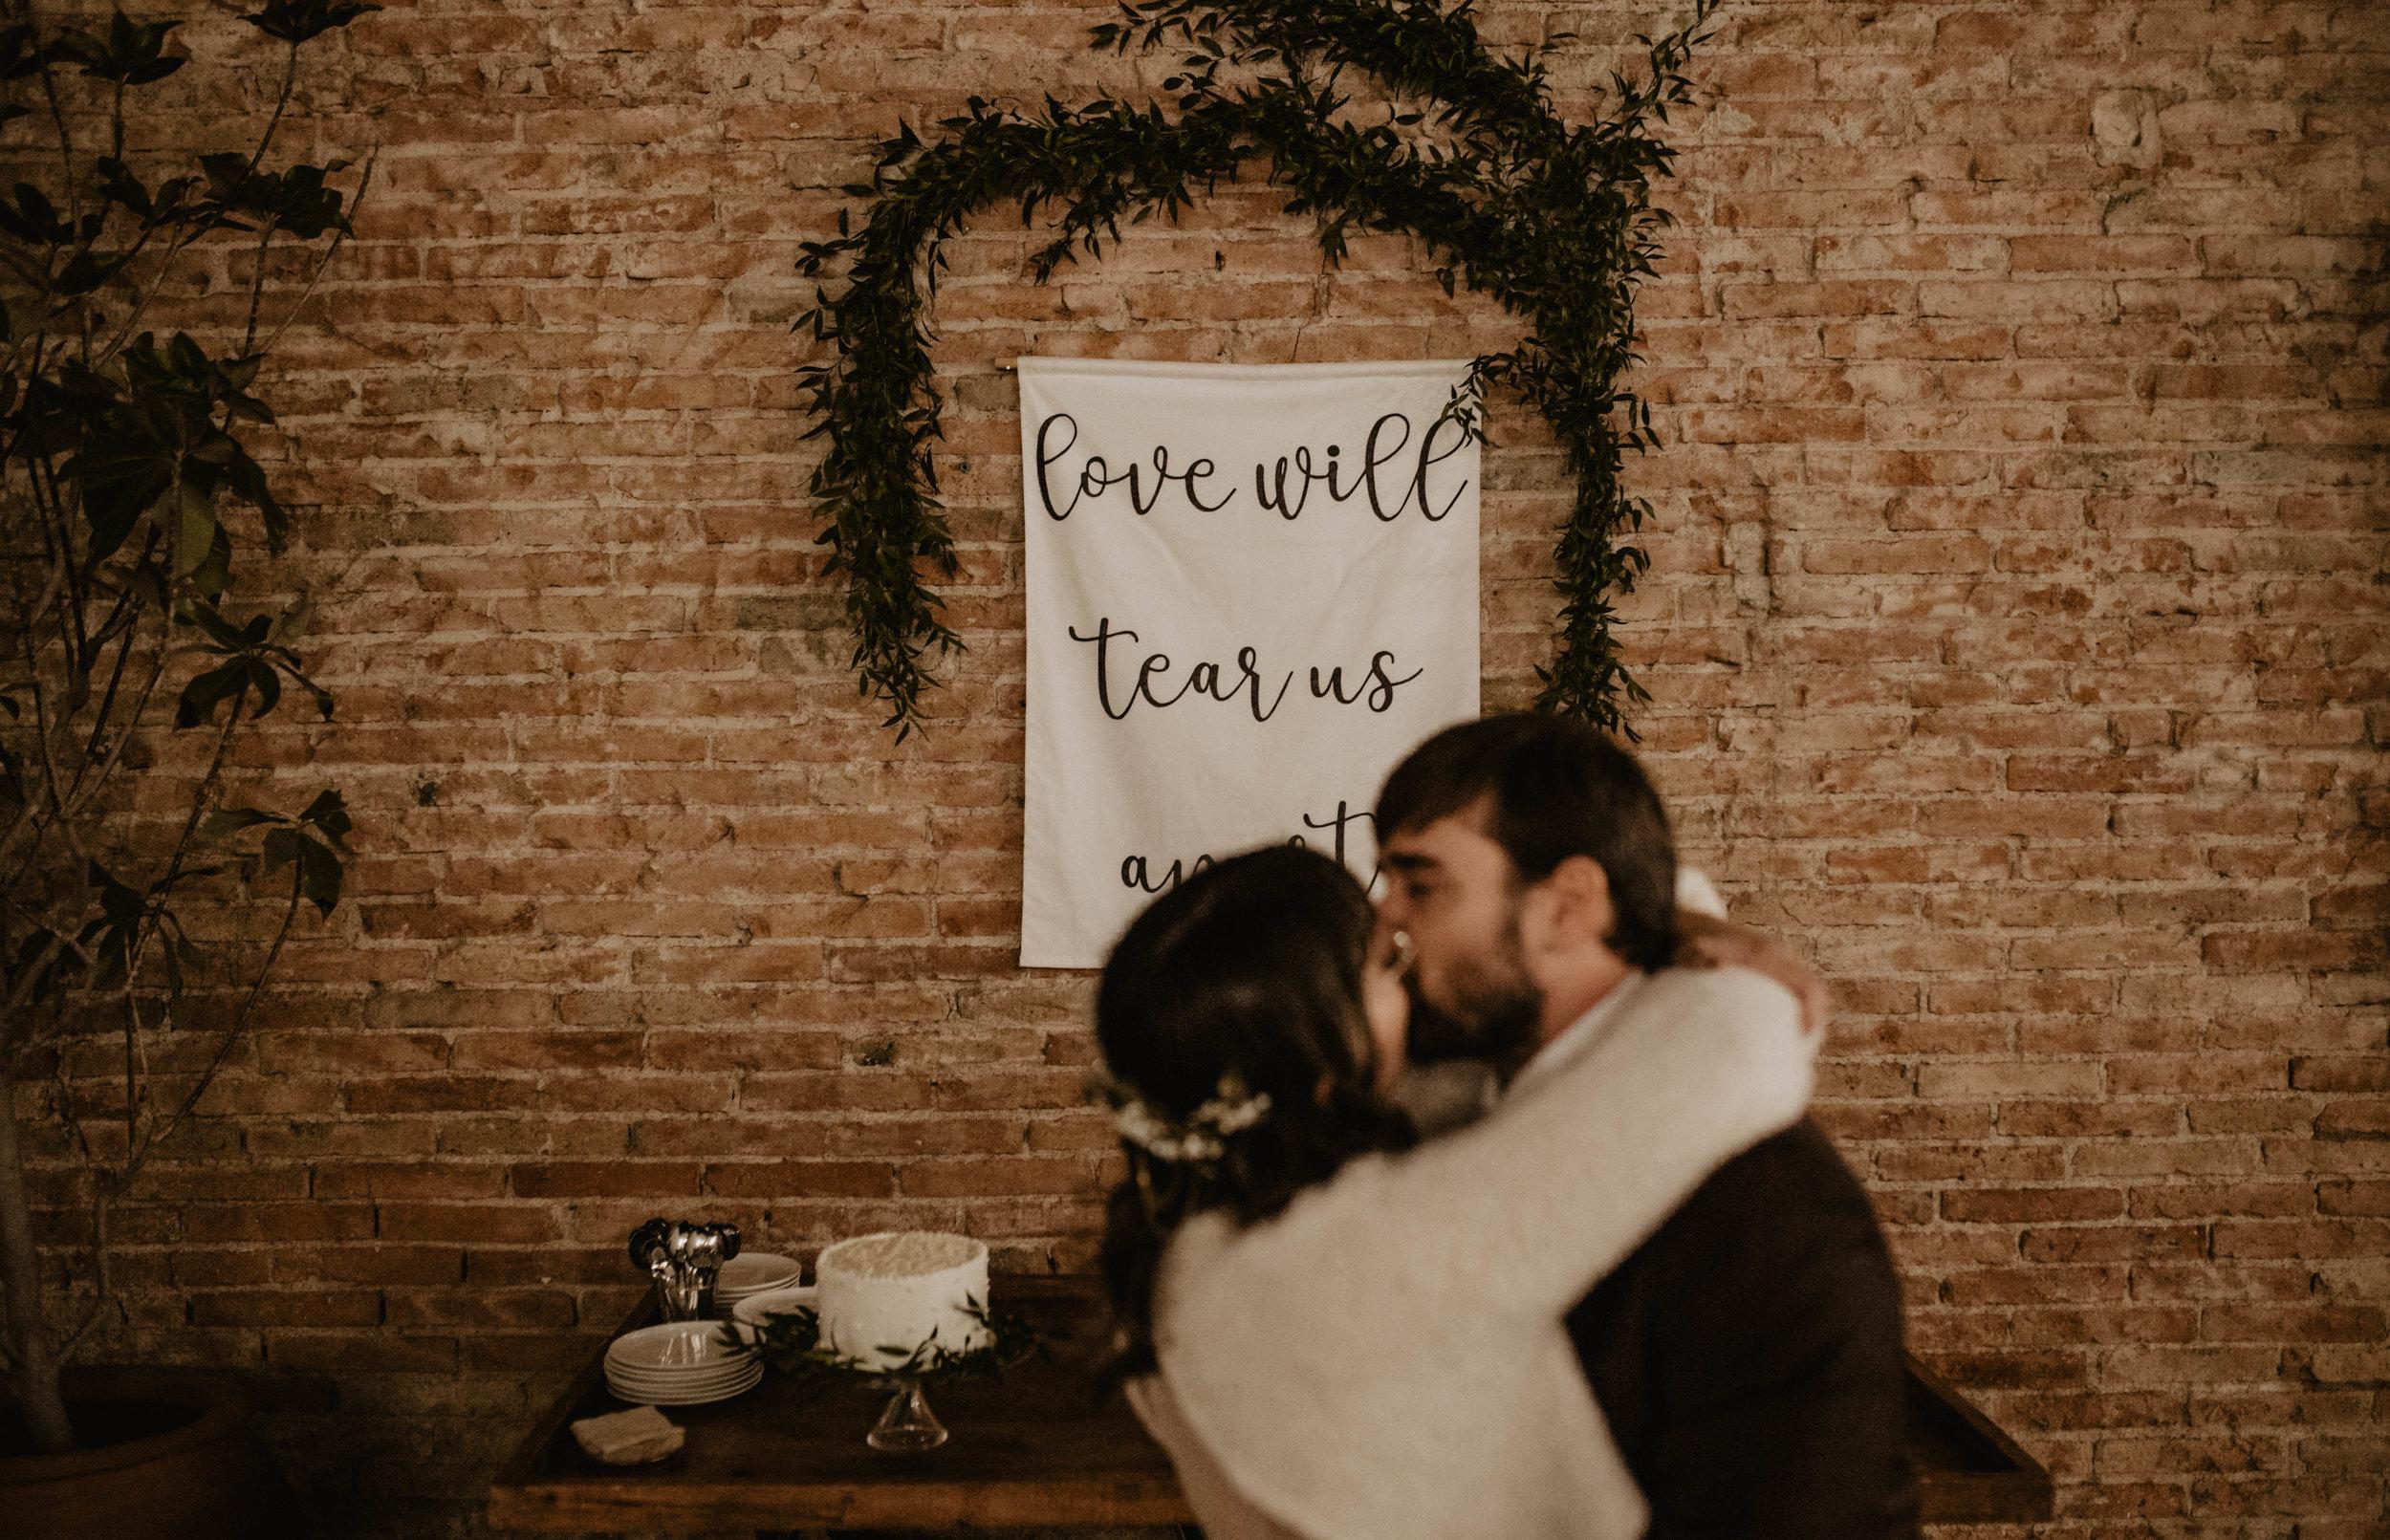 thenortherngirlphotography-photography-weddingphotography-couple-bodasconestilo-bodasenbarcelona-martadavid-1027.jpg